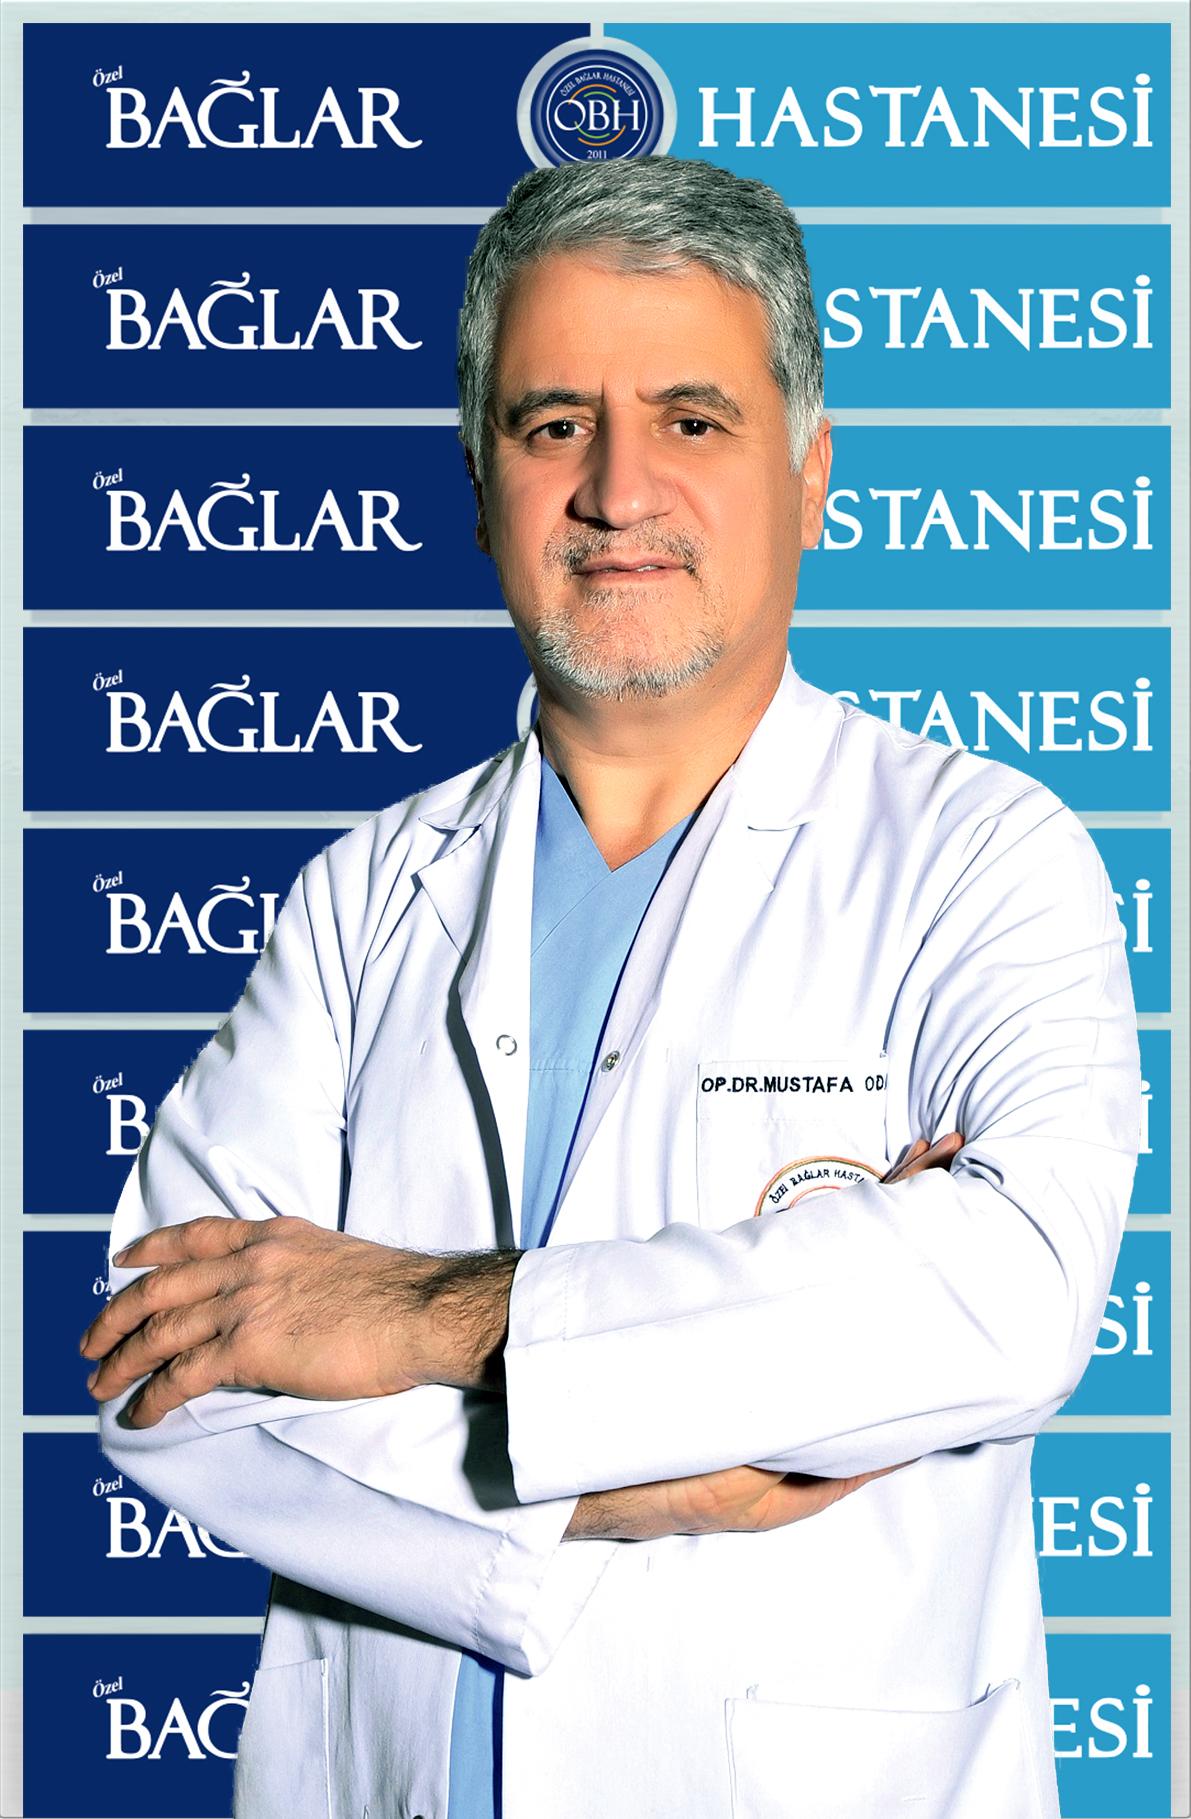 Op. Dr. Mustafa Odabaşı Web